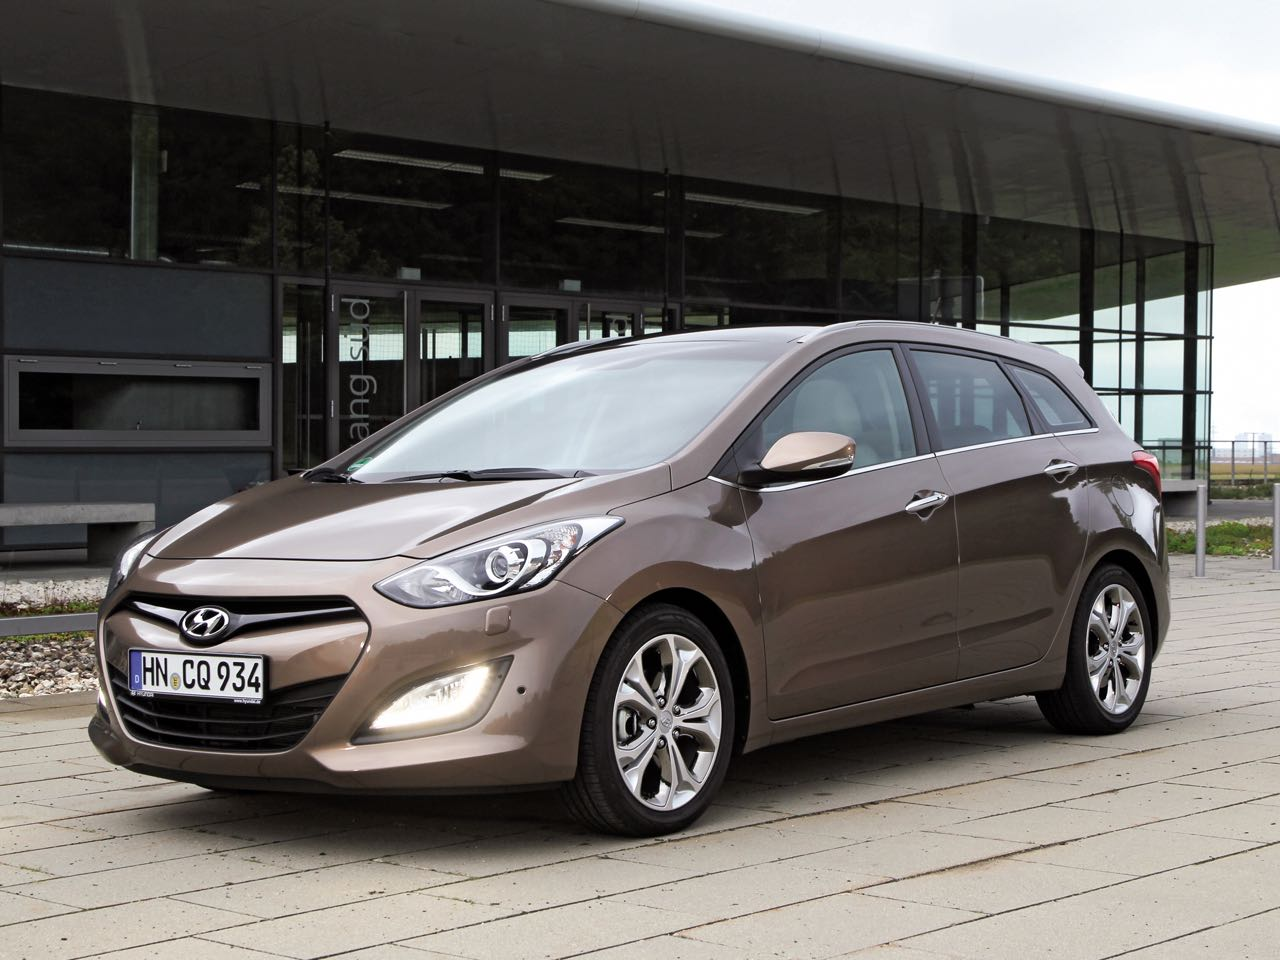 Hyundai i30 CW 2012 – 5